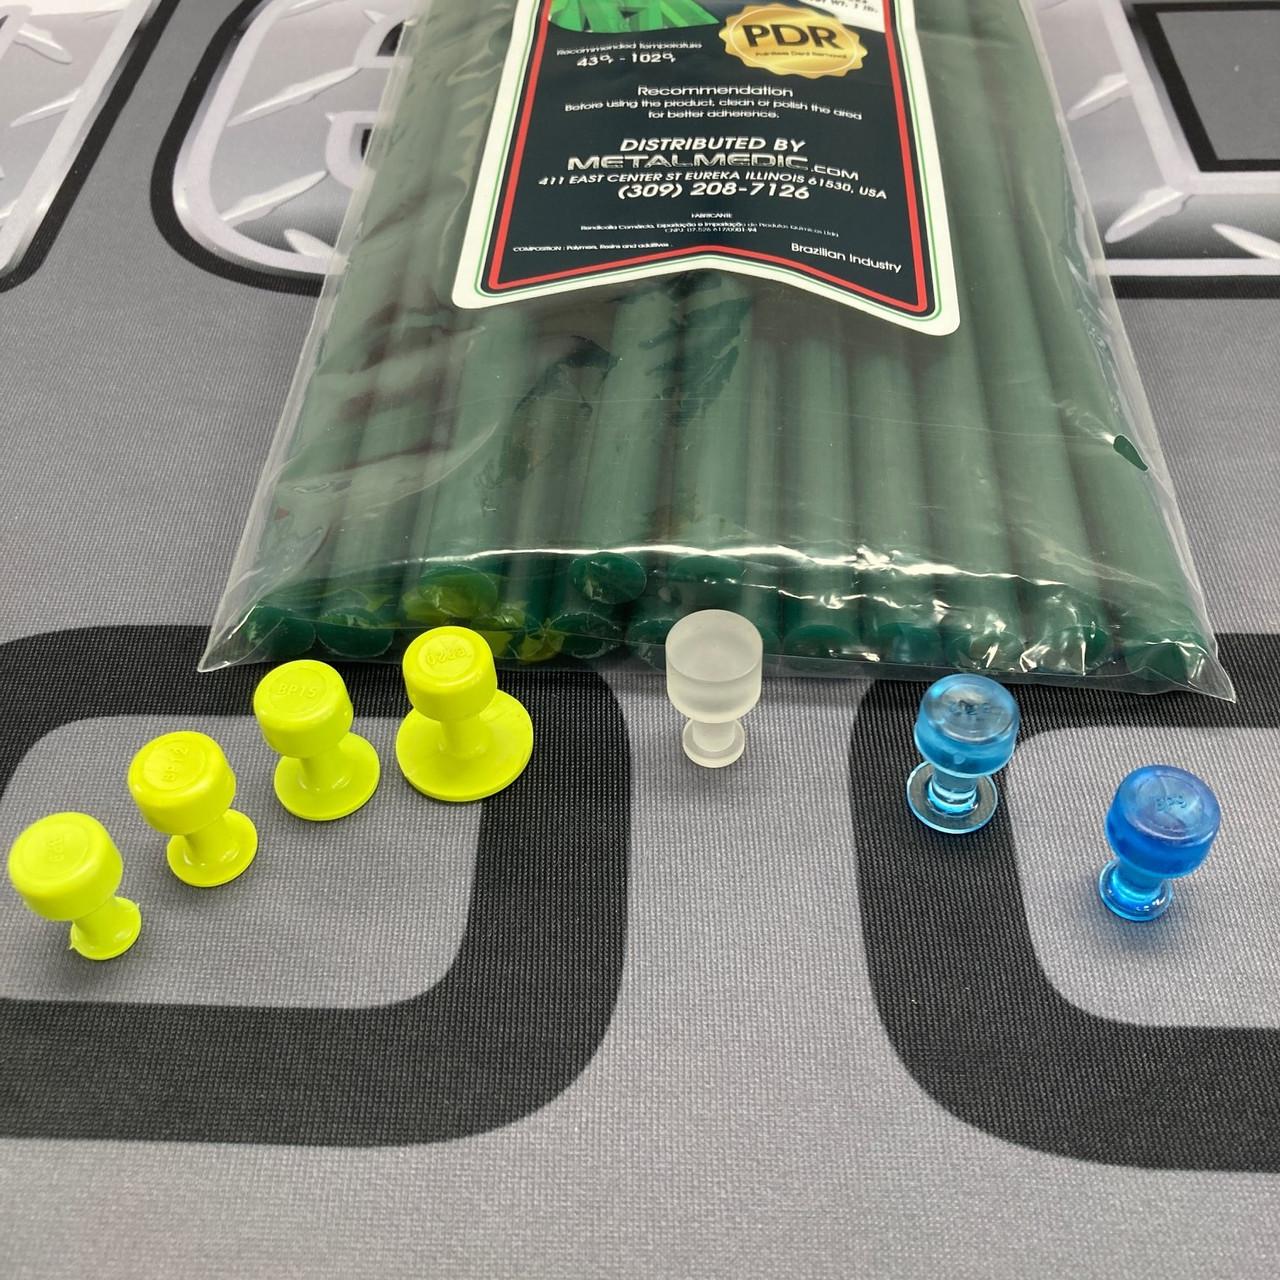 MEGA Power Green PDR Glue w/ BLACK PLAGUE, METALMEDIC Tabs